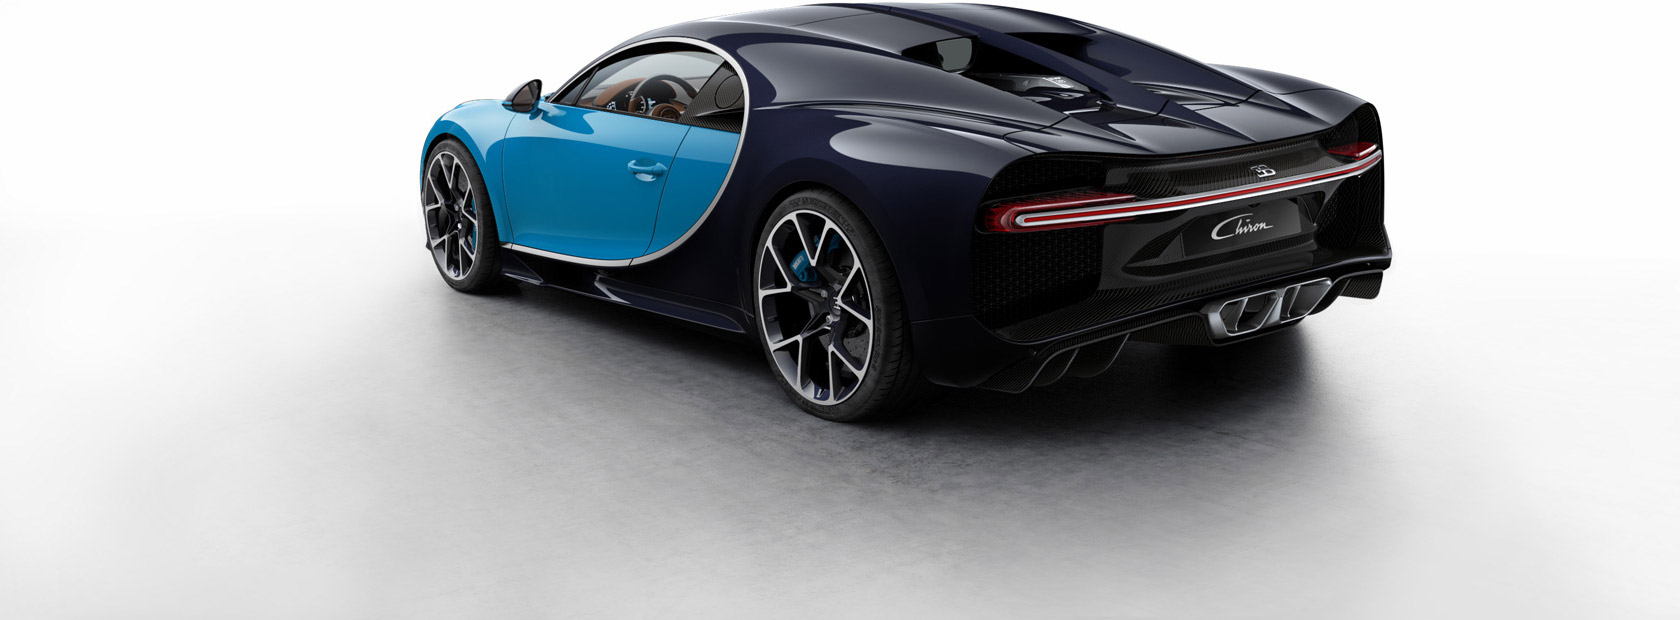 Supercar Bugatti